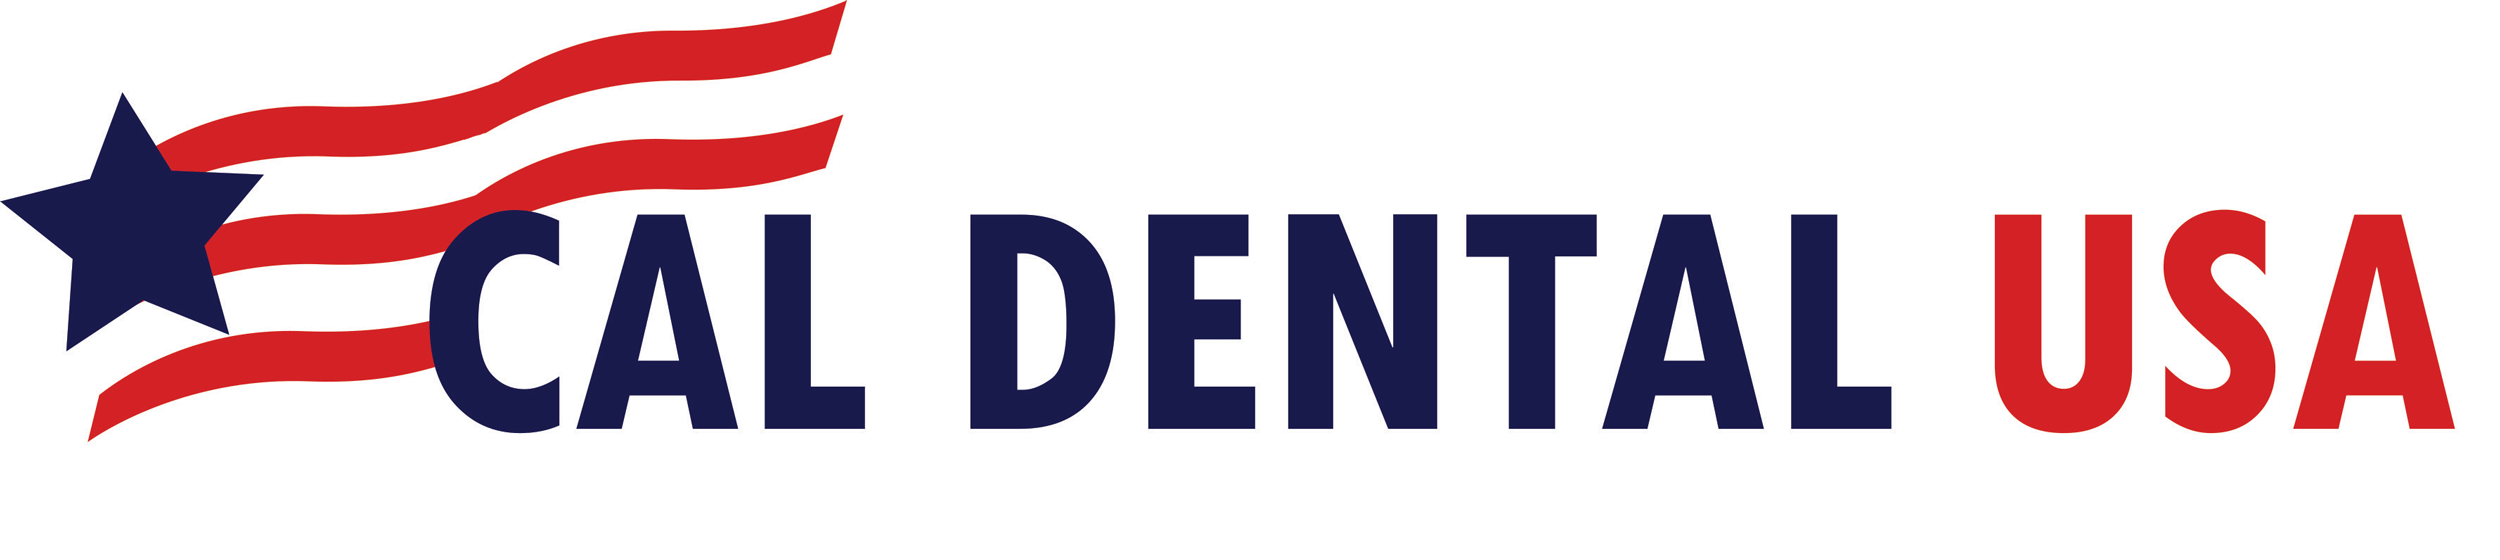 Cal Dental Group